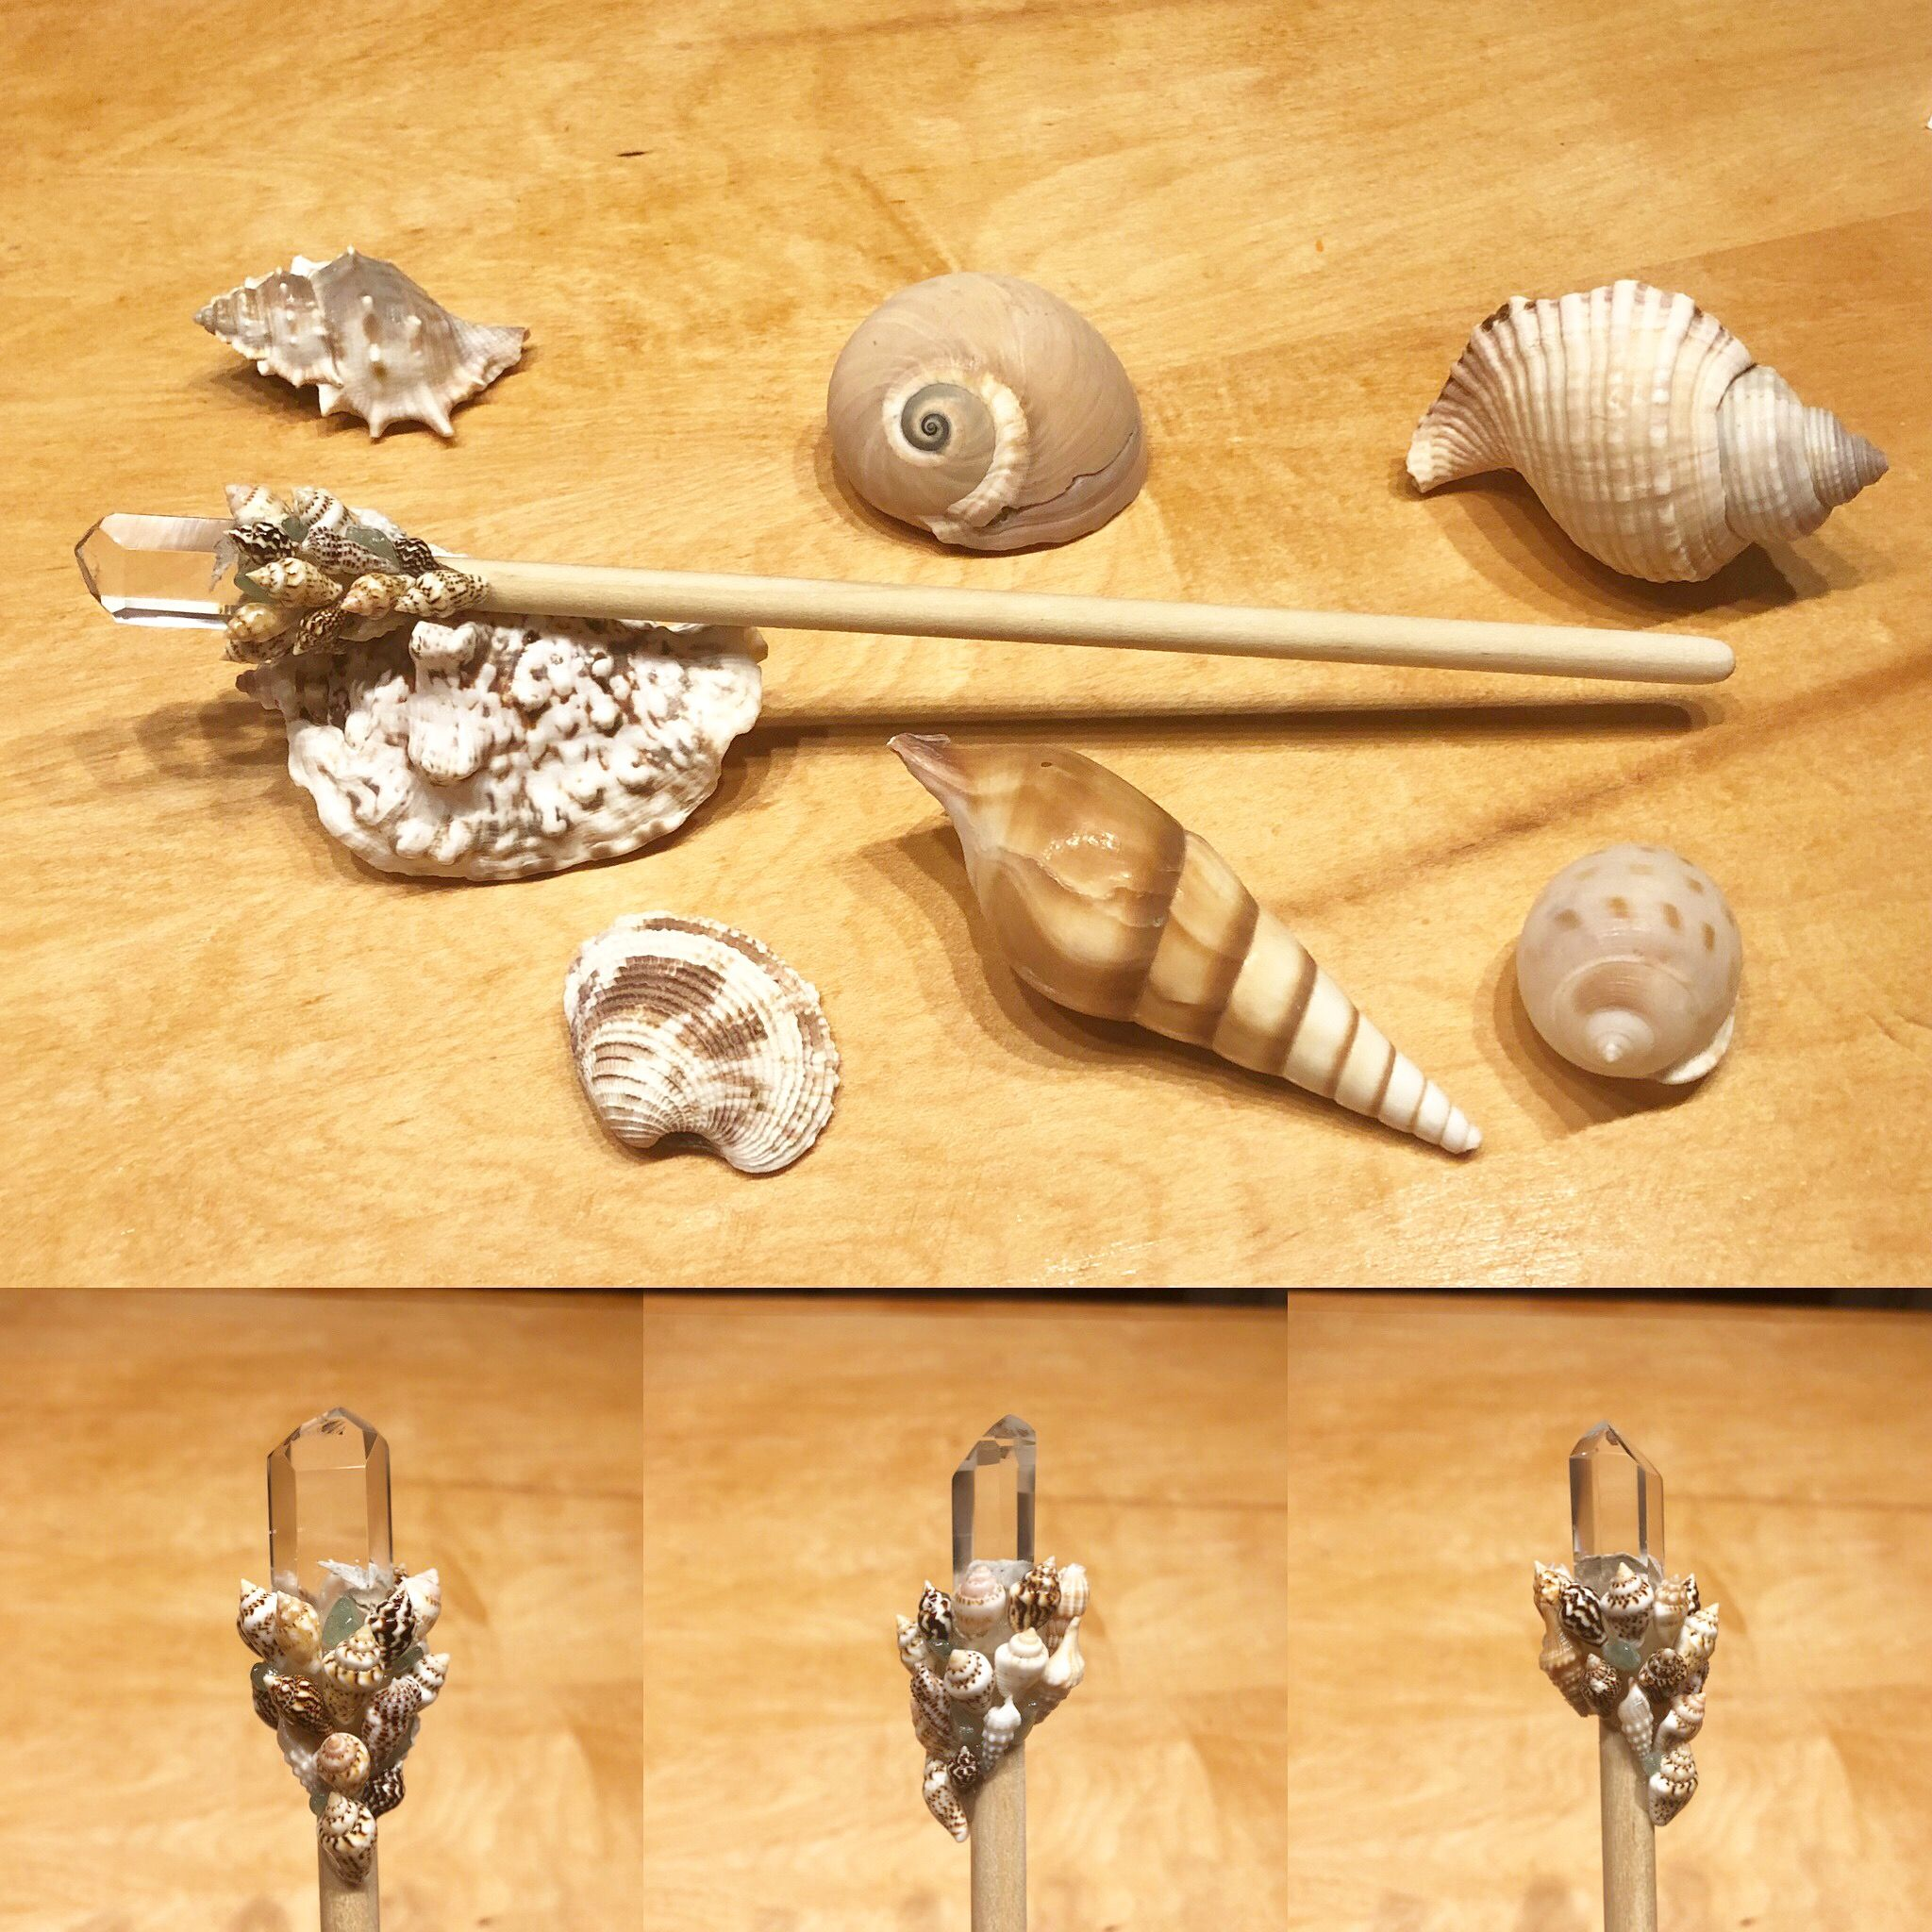 Seashell Magic Wand